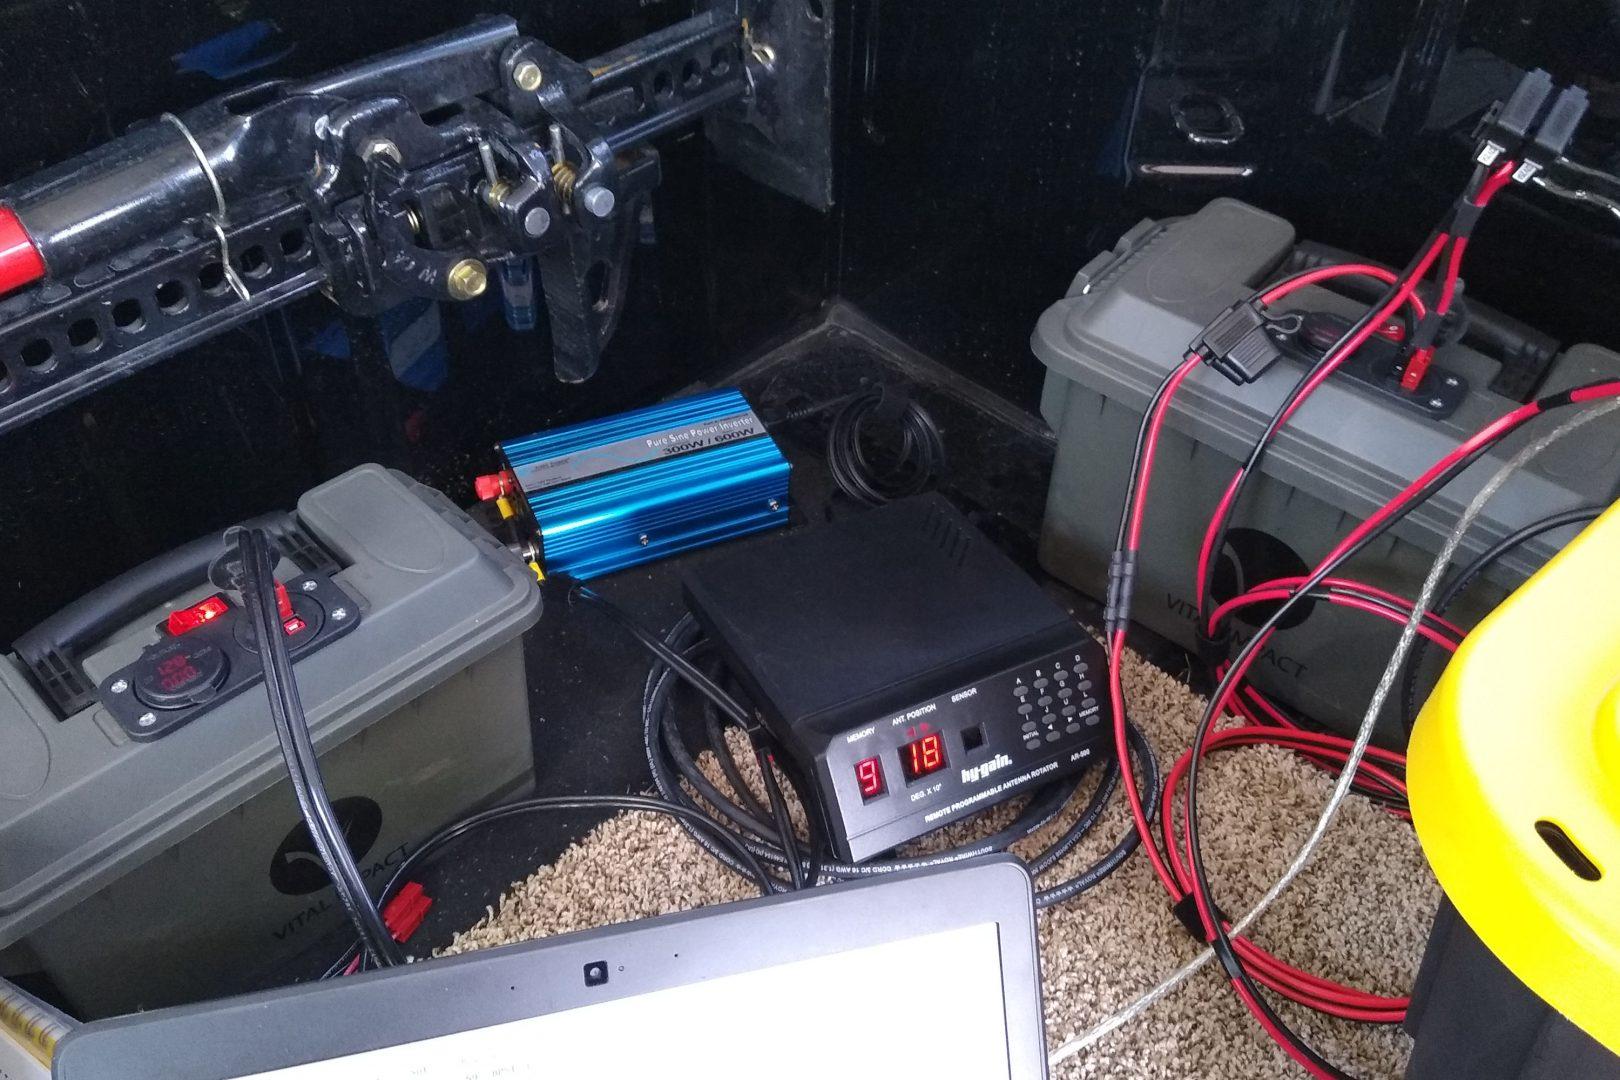 Ham radio field power supplies for a rover